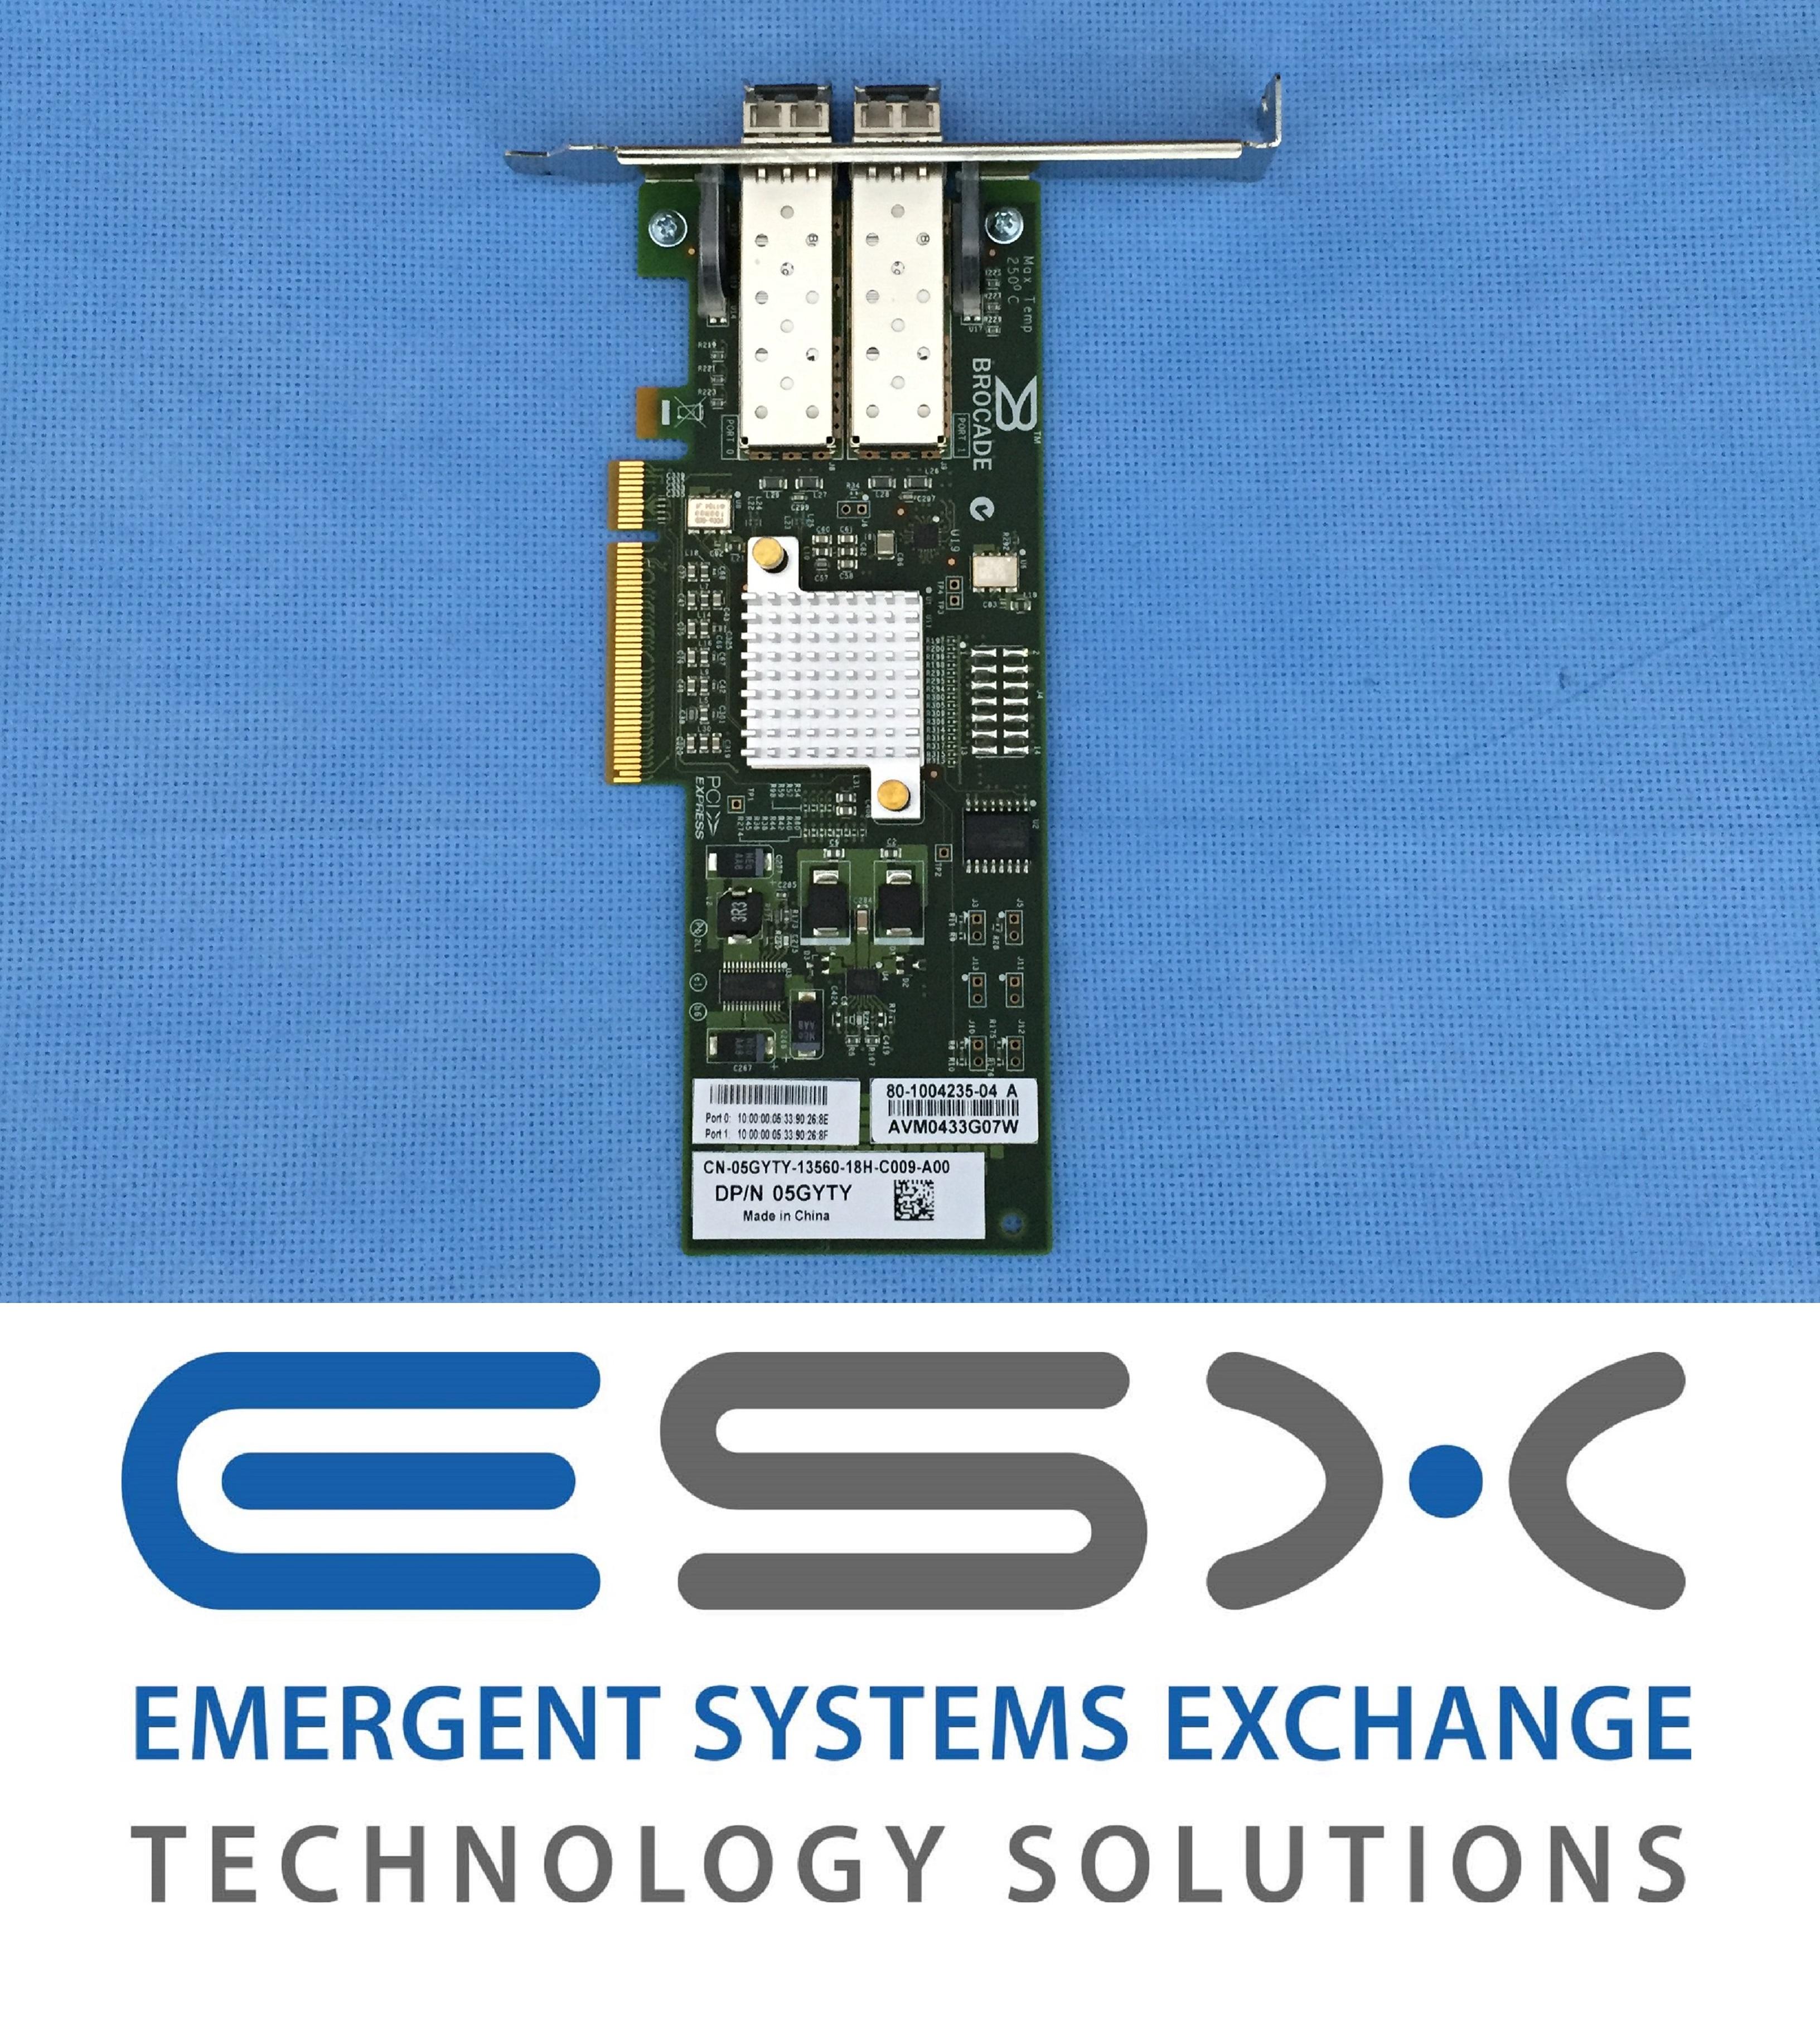 5GYTY Dell Brocade 825 Dual Port 8Gb//s FC Host Bust Adapter HBA